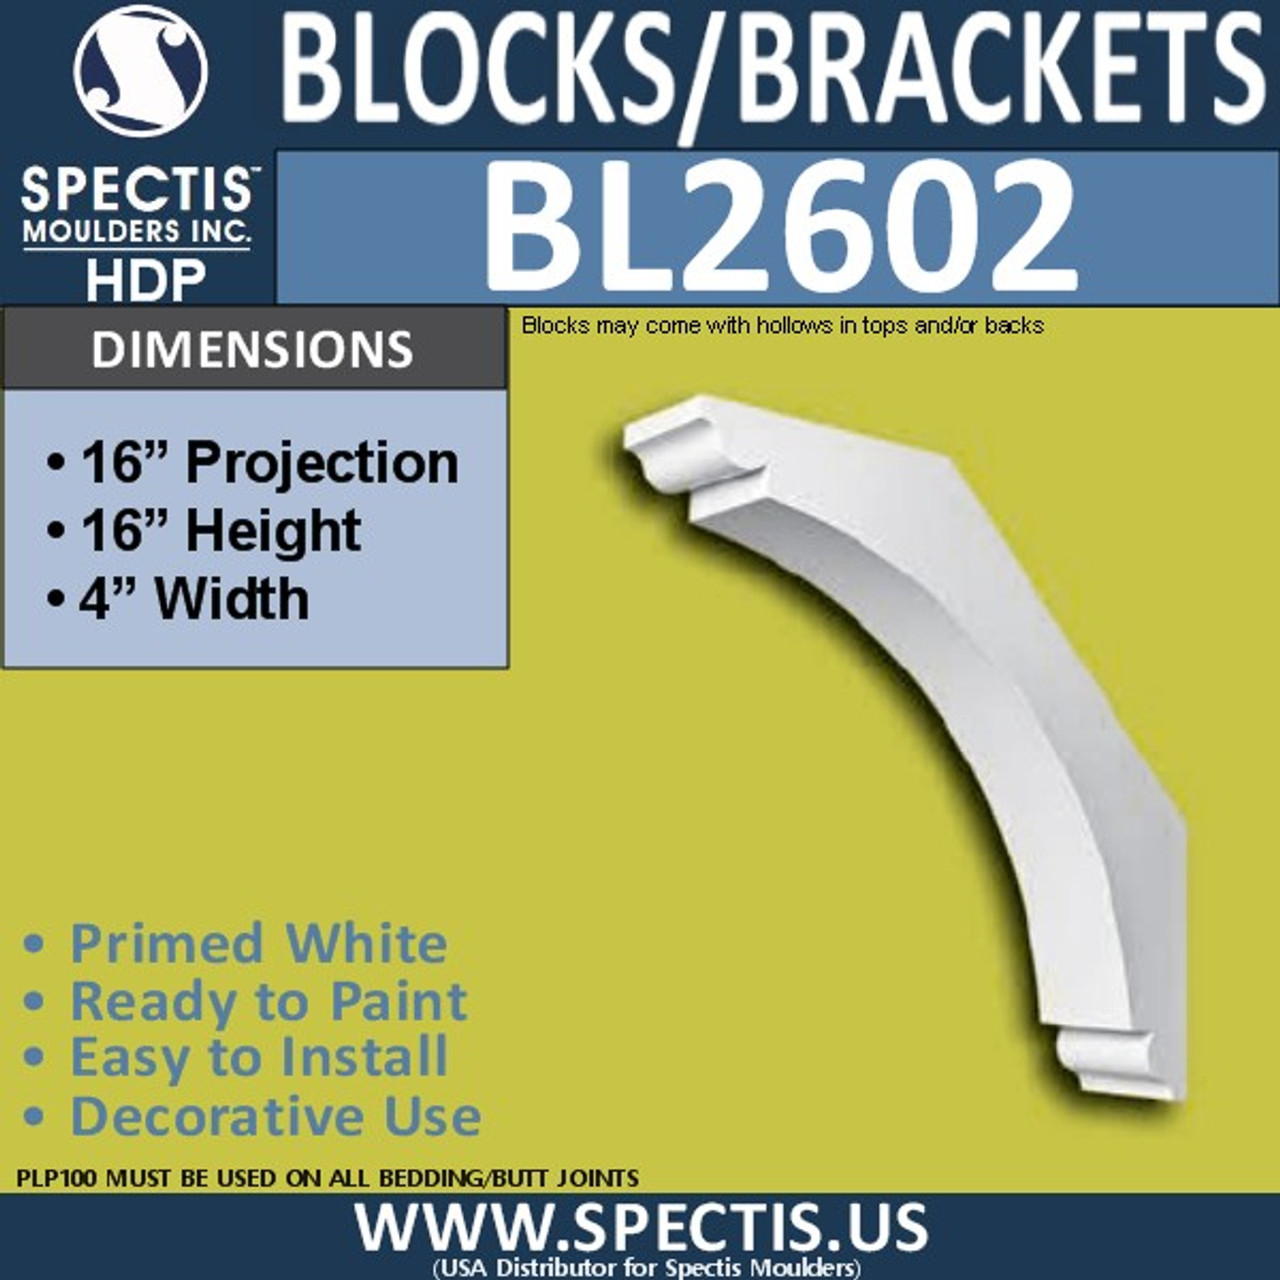 "BL2602 Eave Block or Bracket 4""W x 16""H x 16"" P"